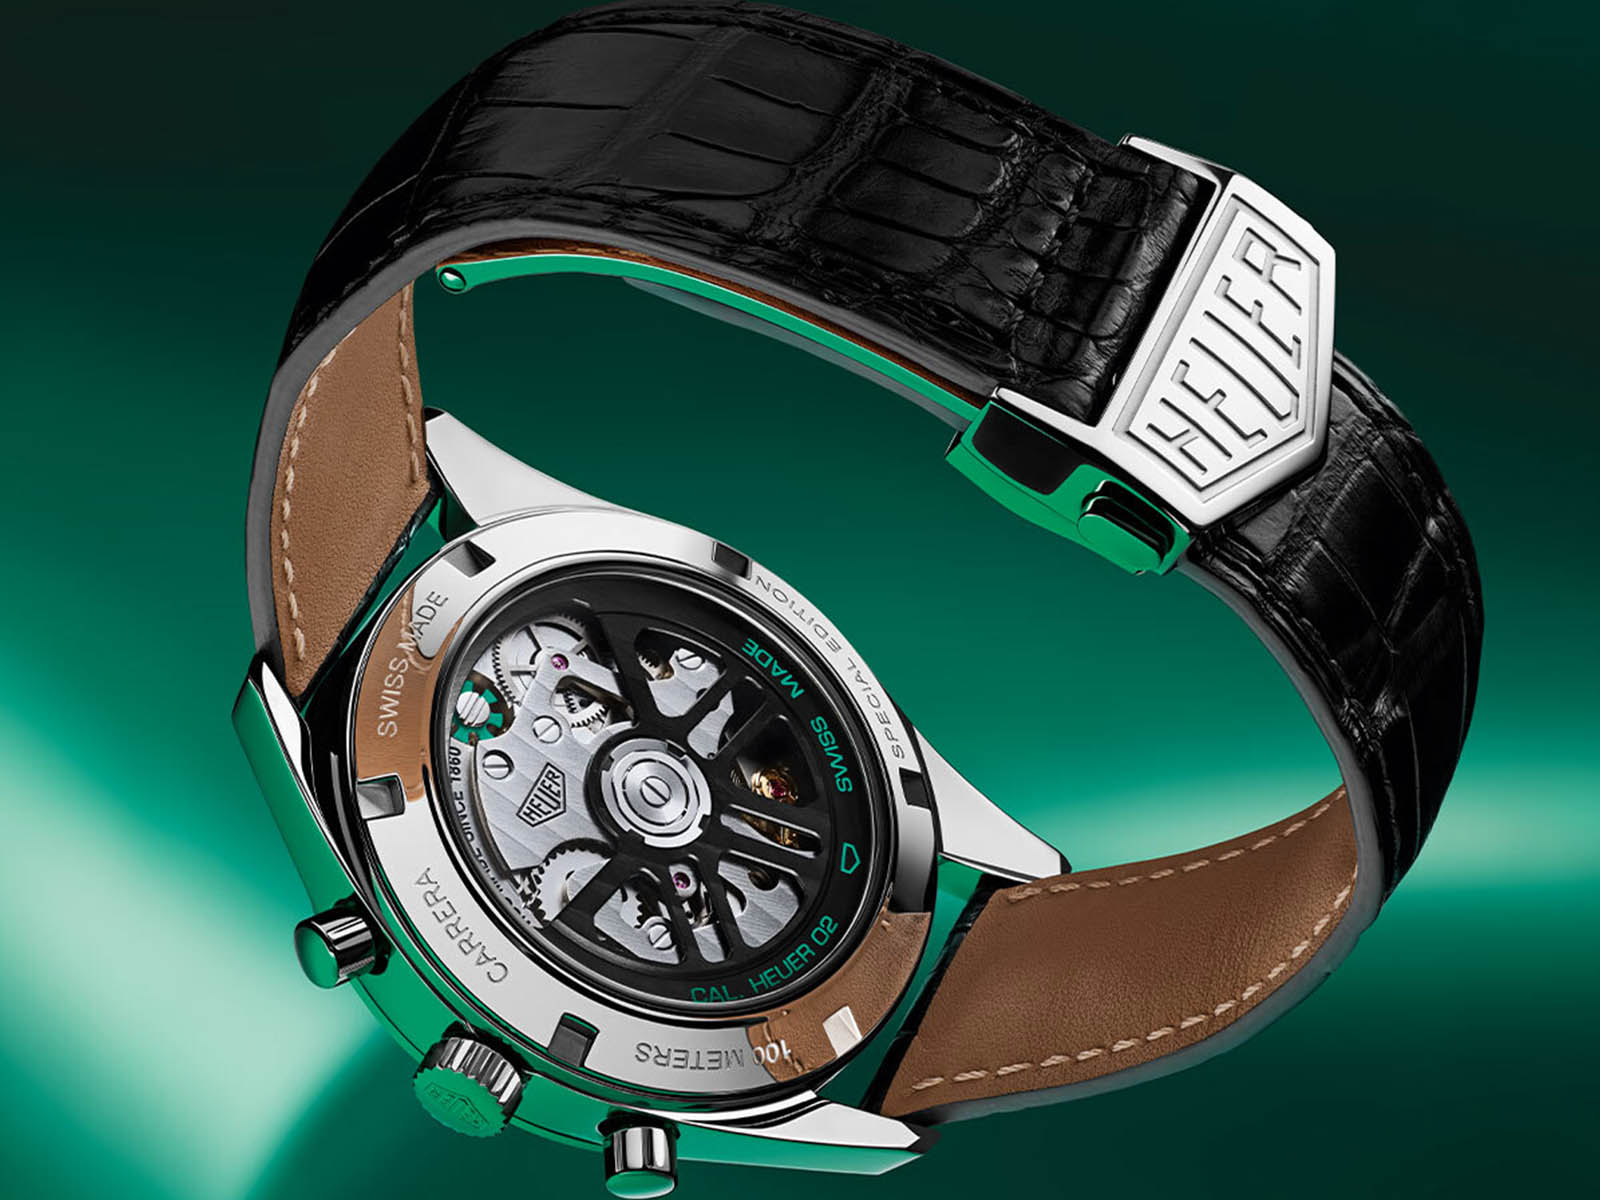 cbk221f-fc6479-tag-heuer-carrera-green-special-edition-7.jpg